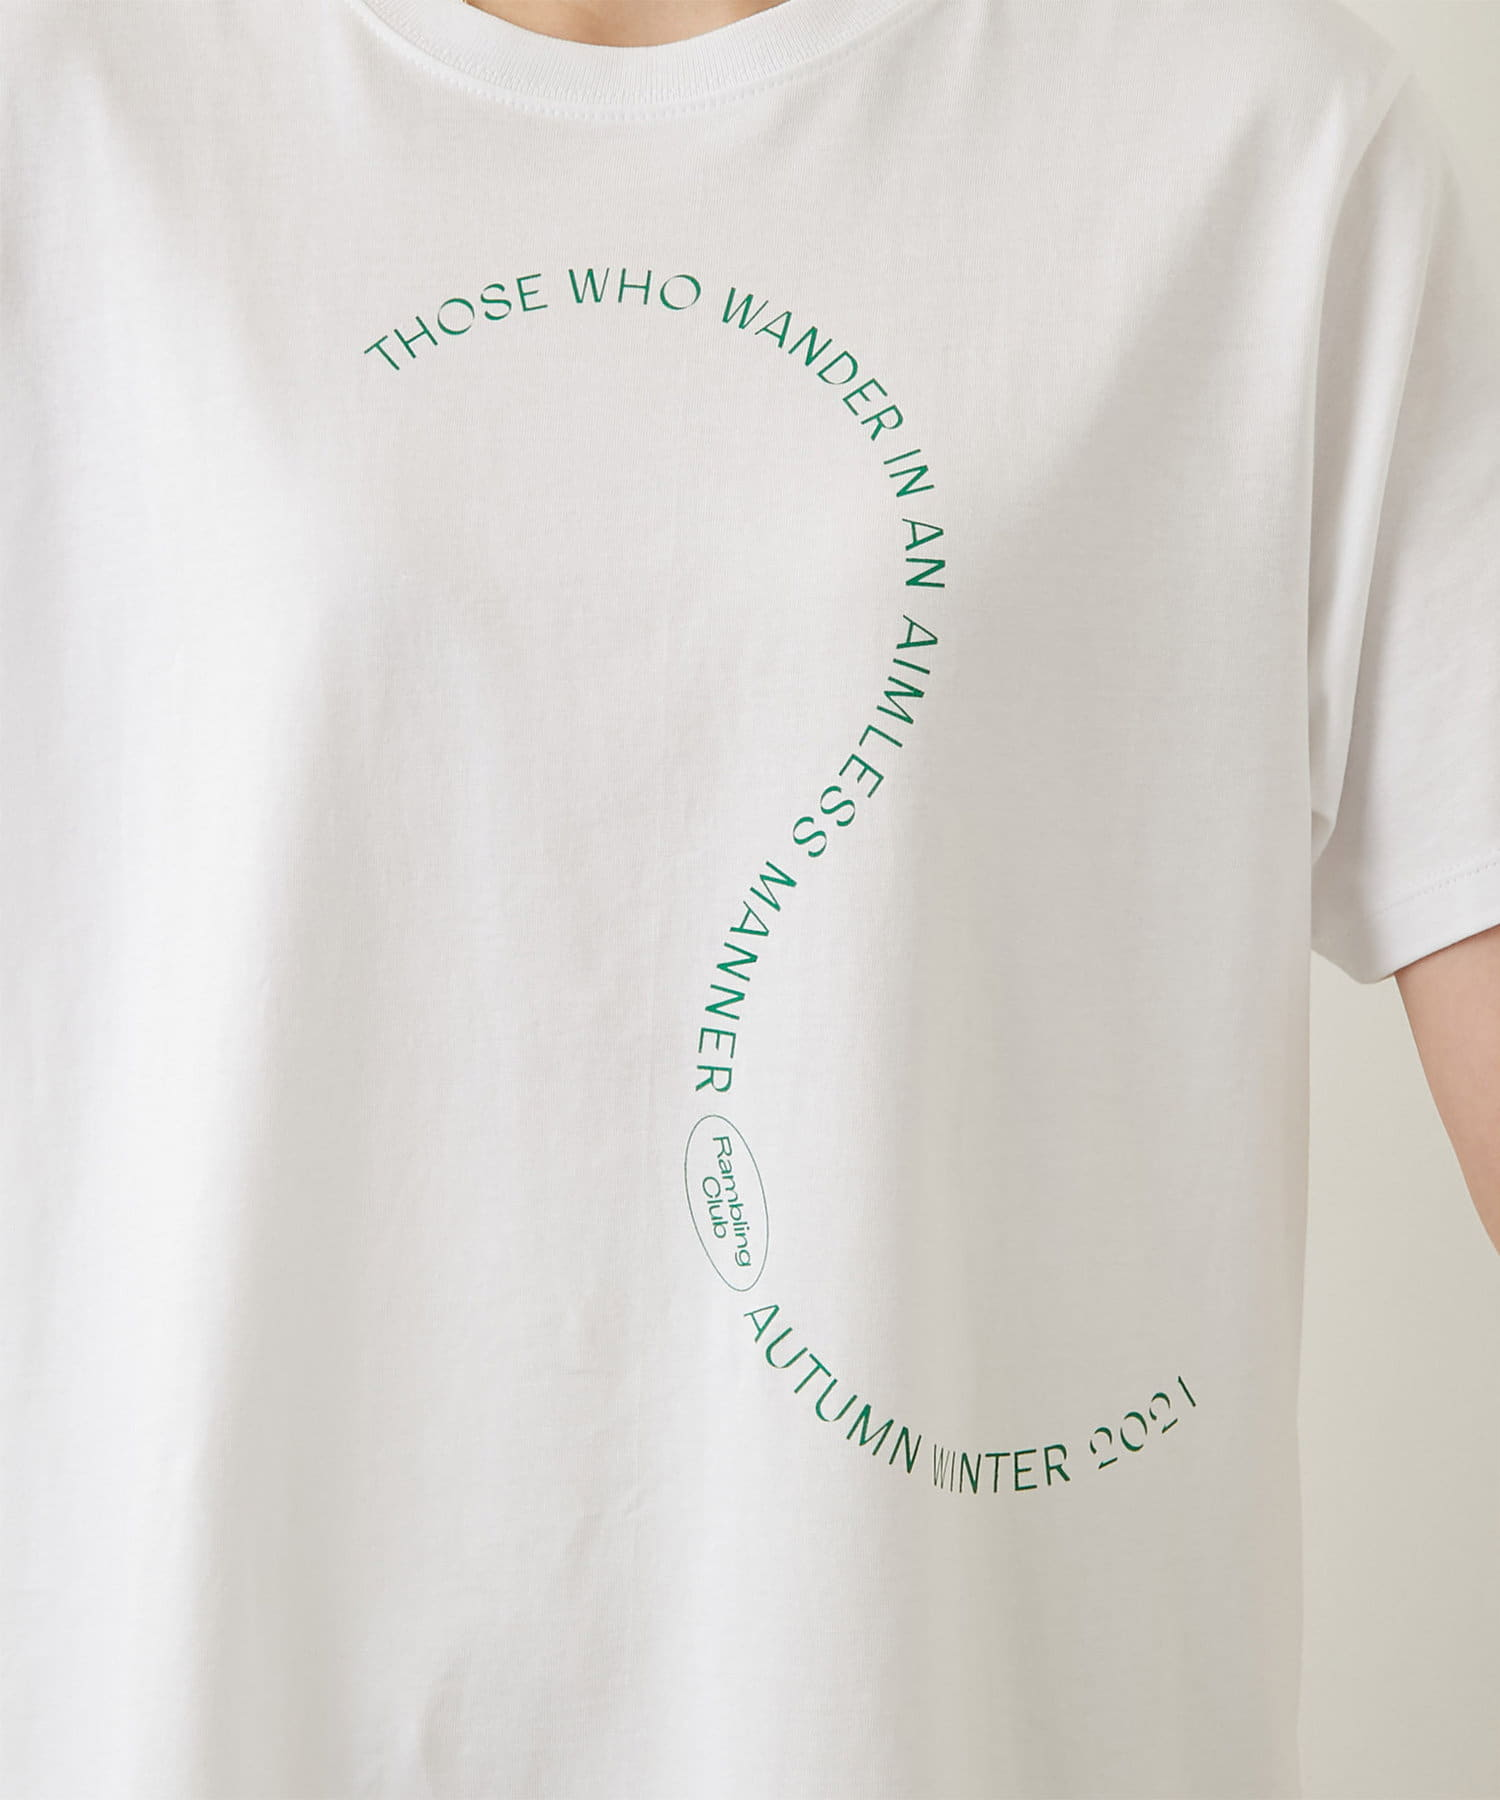 GALLARDAGALANTE(ガリャルダガランテ) 【Personal Effects】グラフィックTシャツ